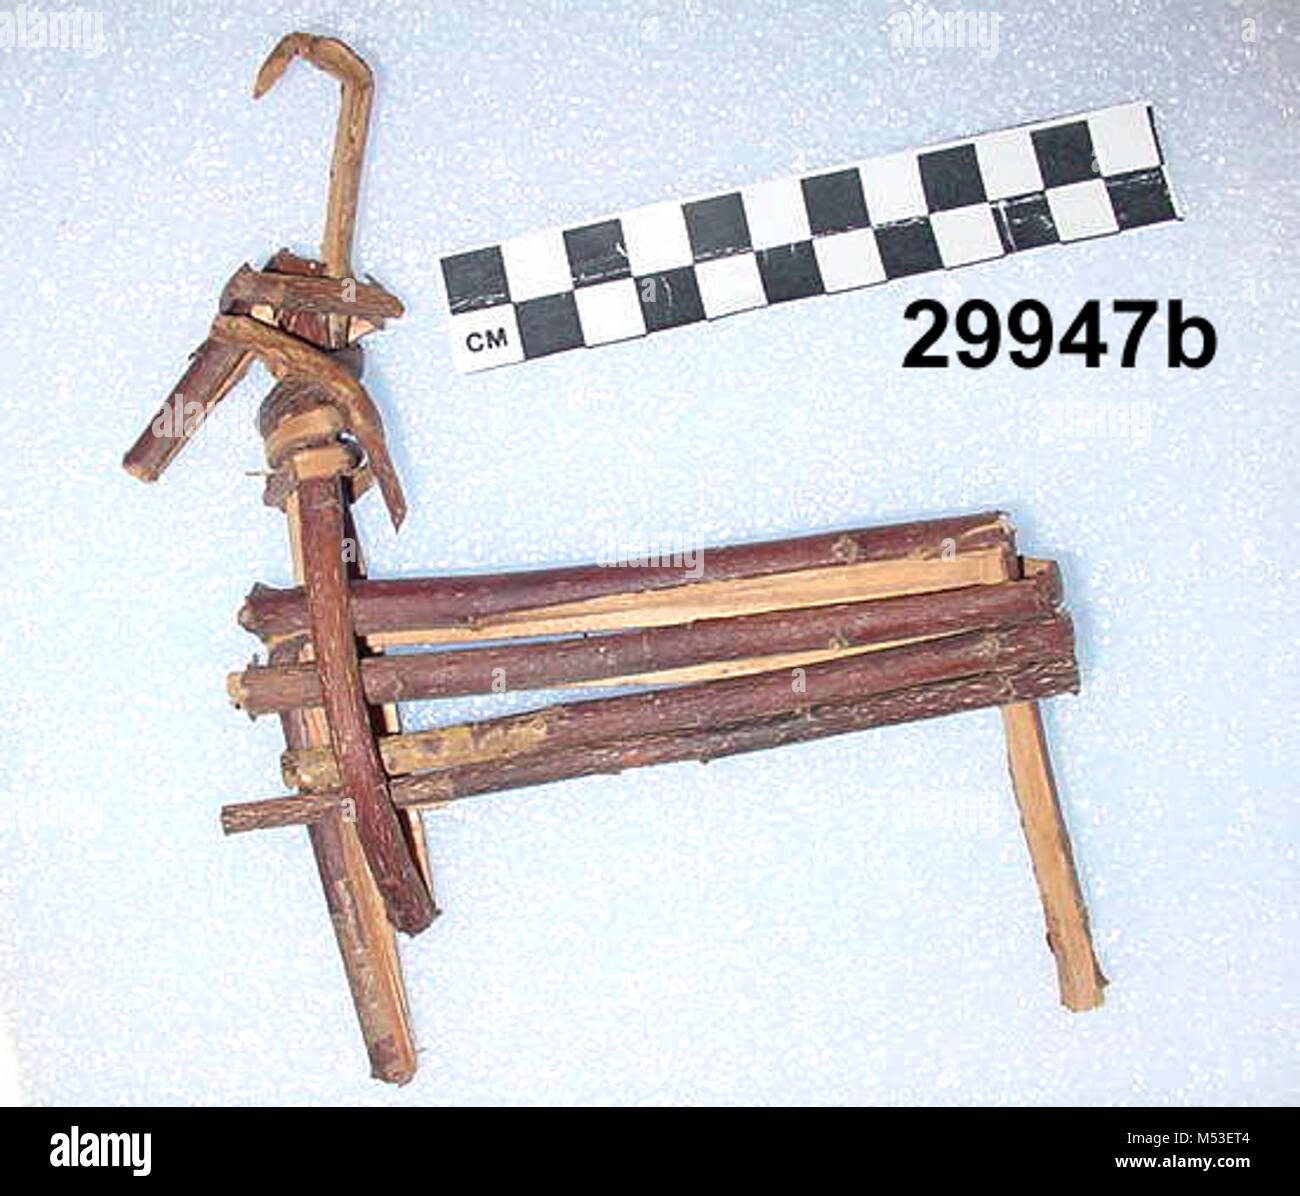 Split-Twig Figurine GRCAb. - Stock Image